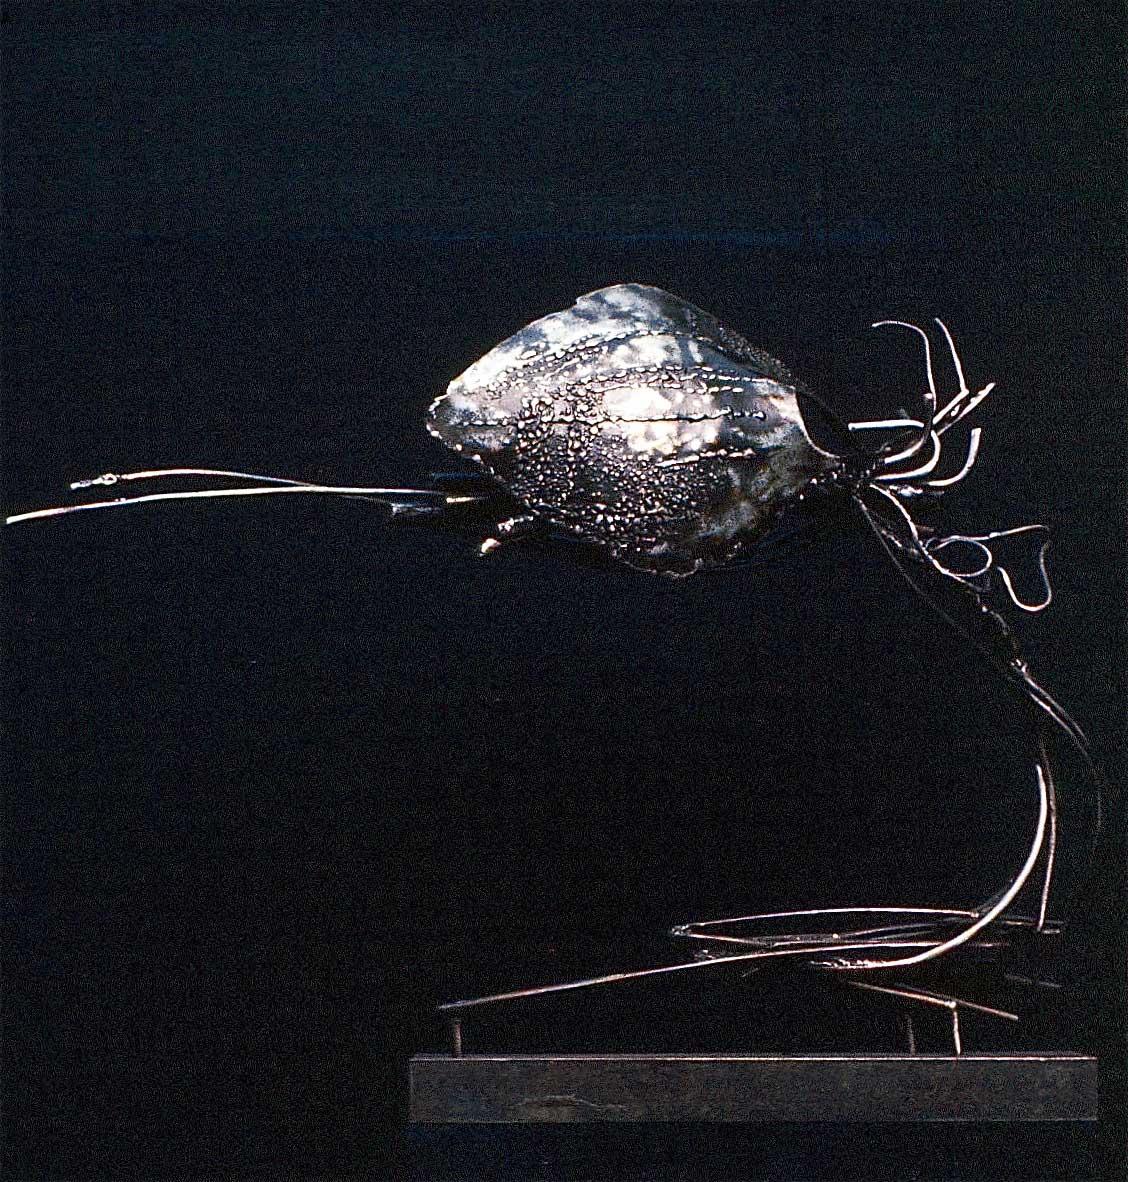 Le-scarabee-03